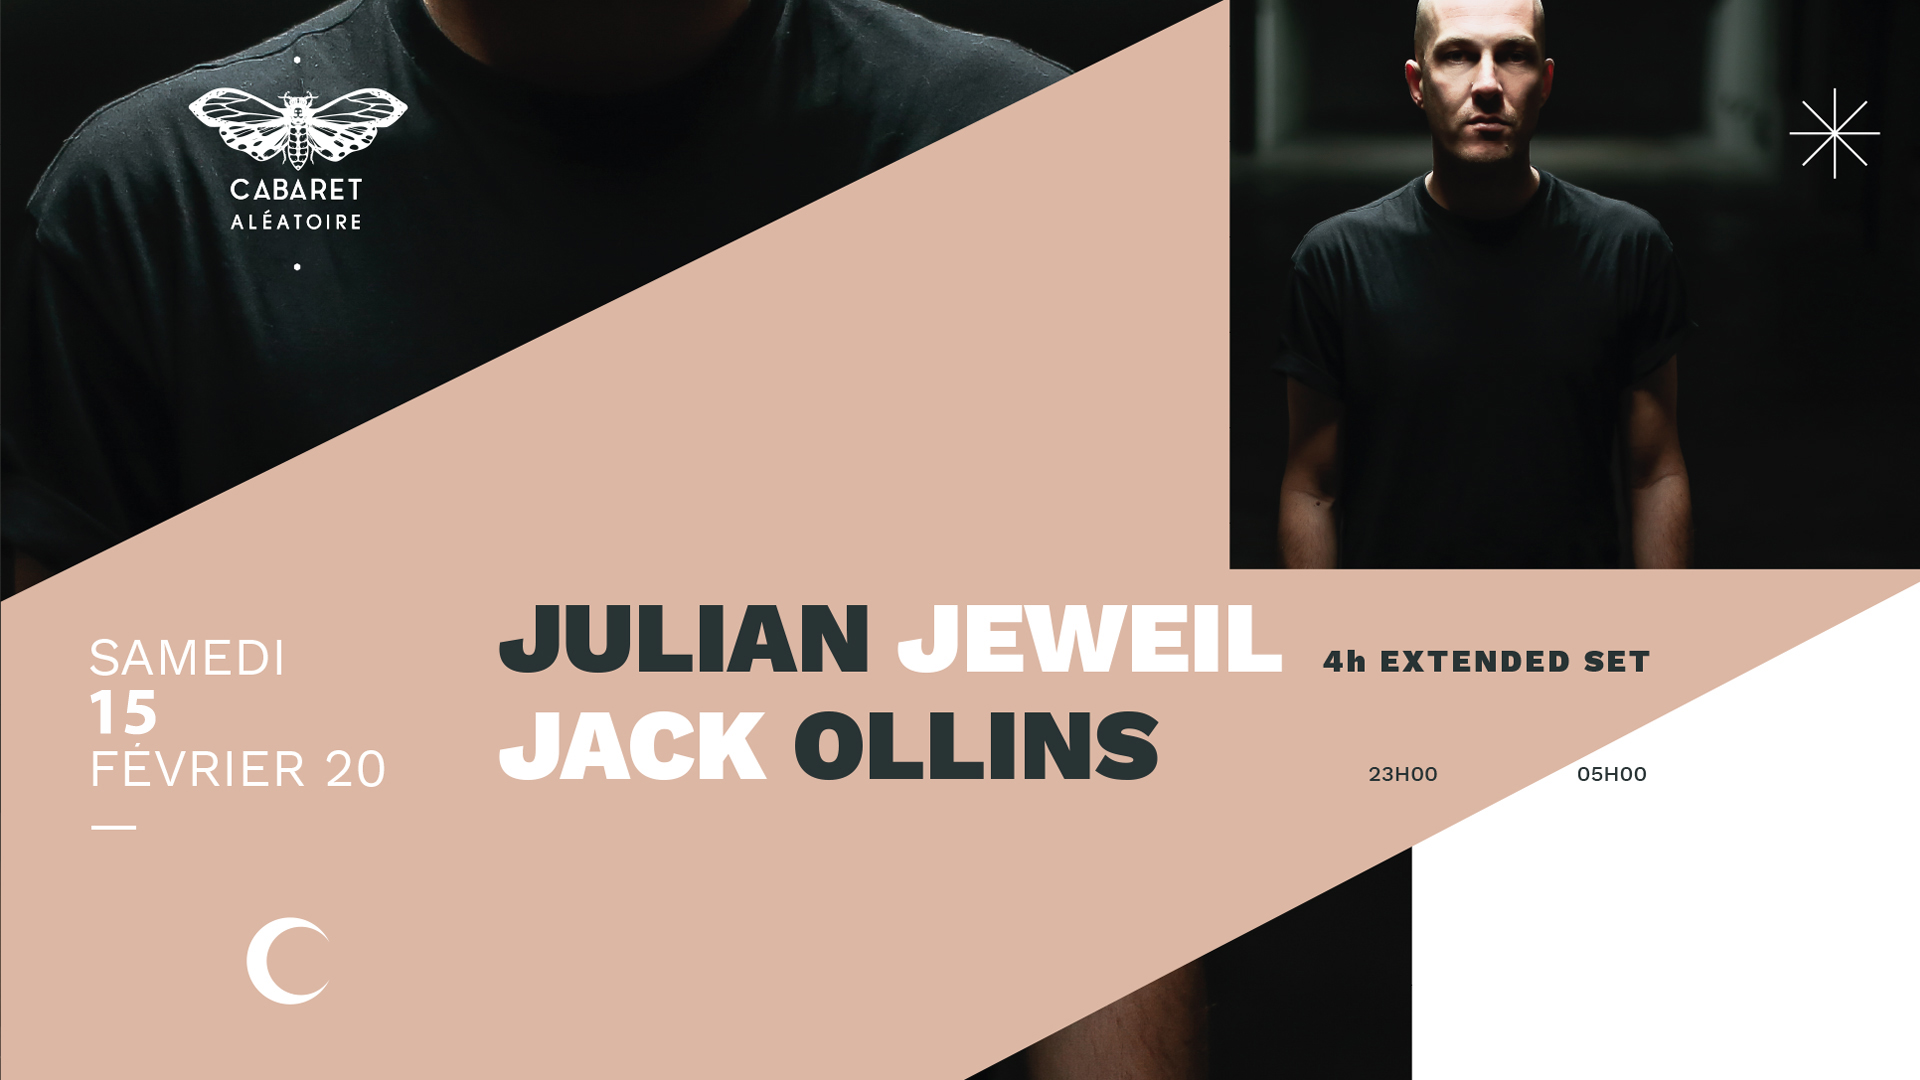 JULIAN JEWEIL [Extended set- 4H] + JACK OLLINS